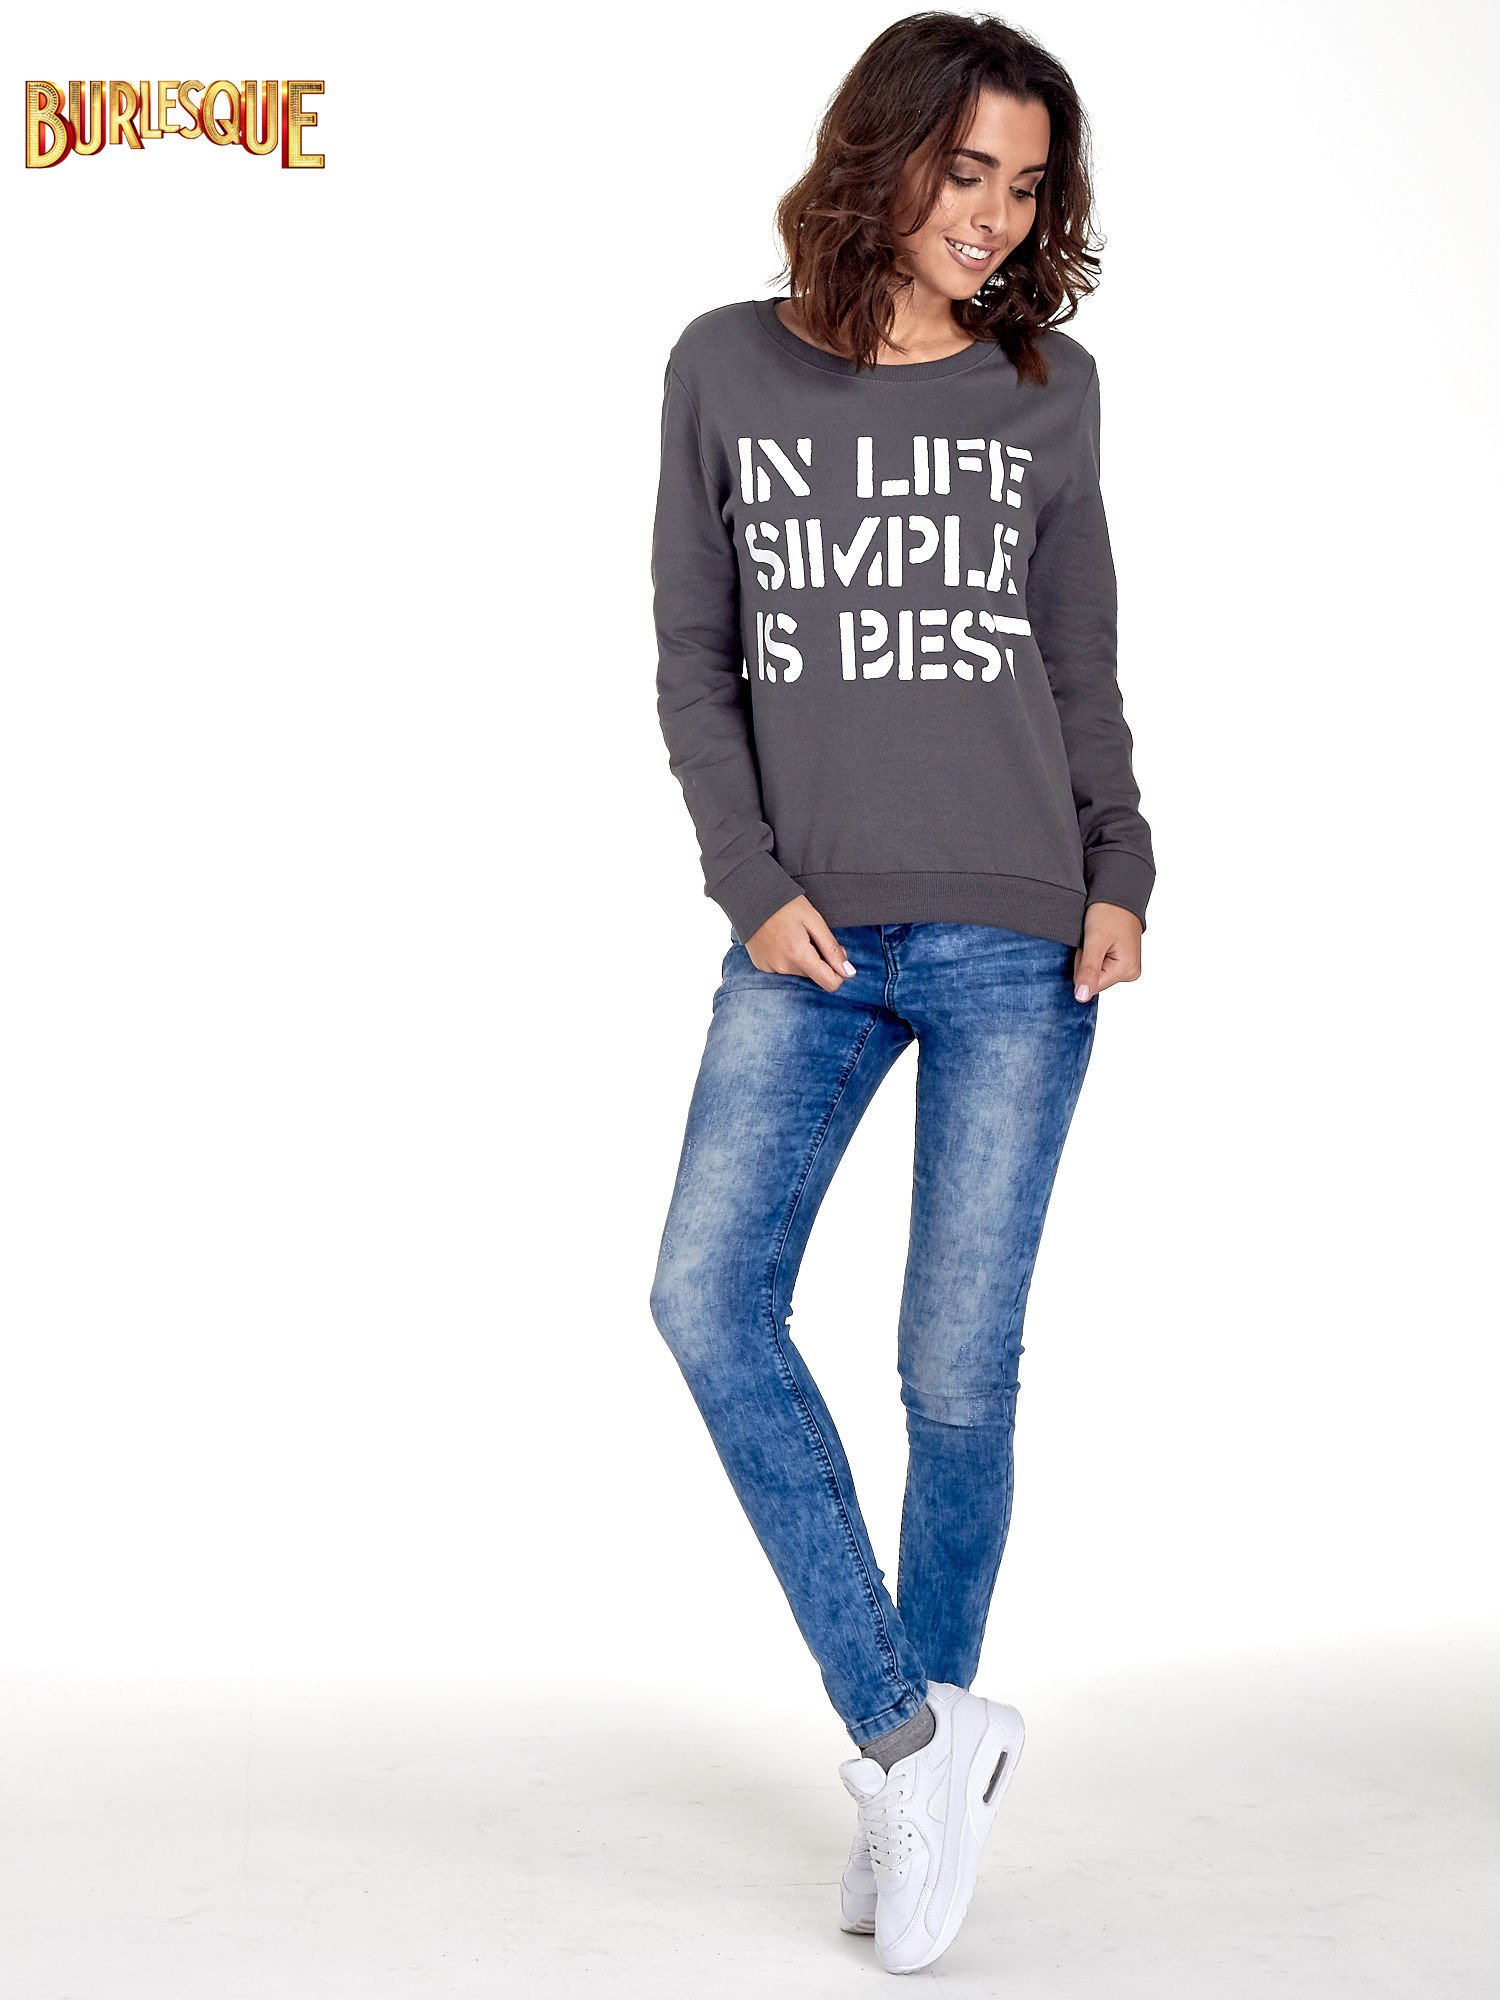 Ciemnoszara klasyczna bluza damska z napisem IN LIFE SIMPLE IS BEST                                  zdj.                                  2